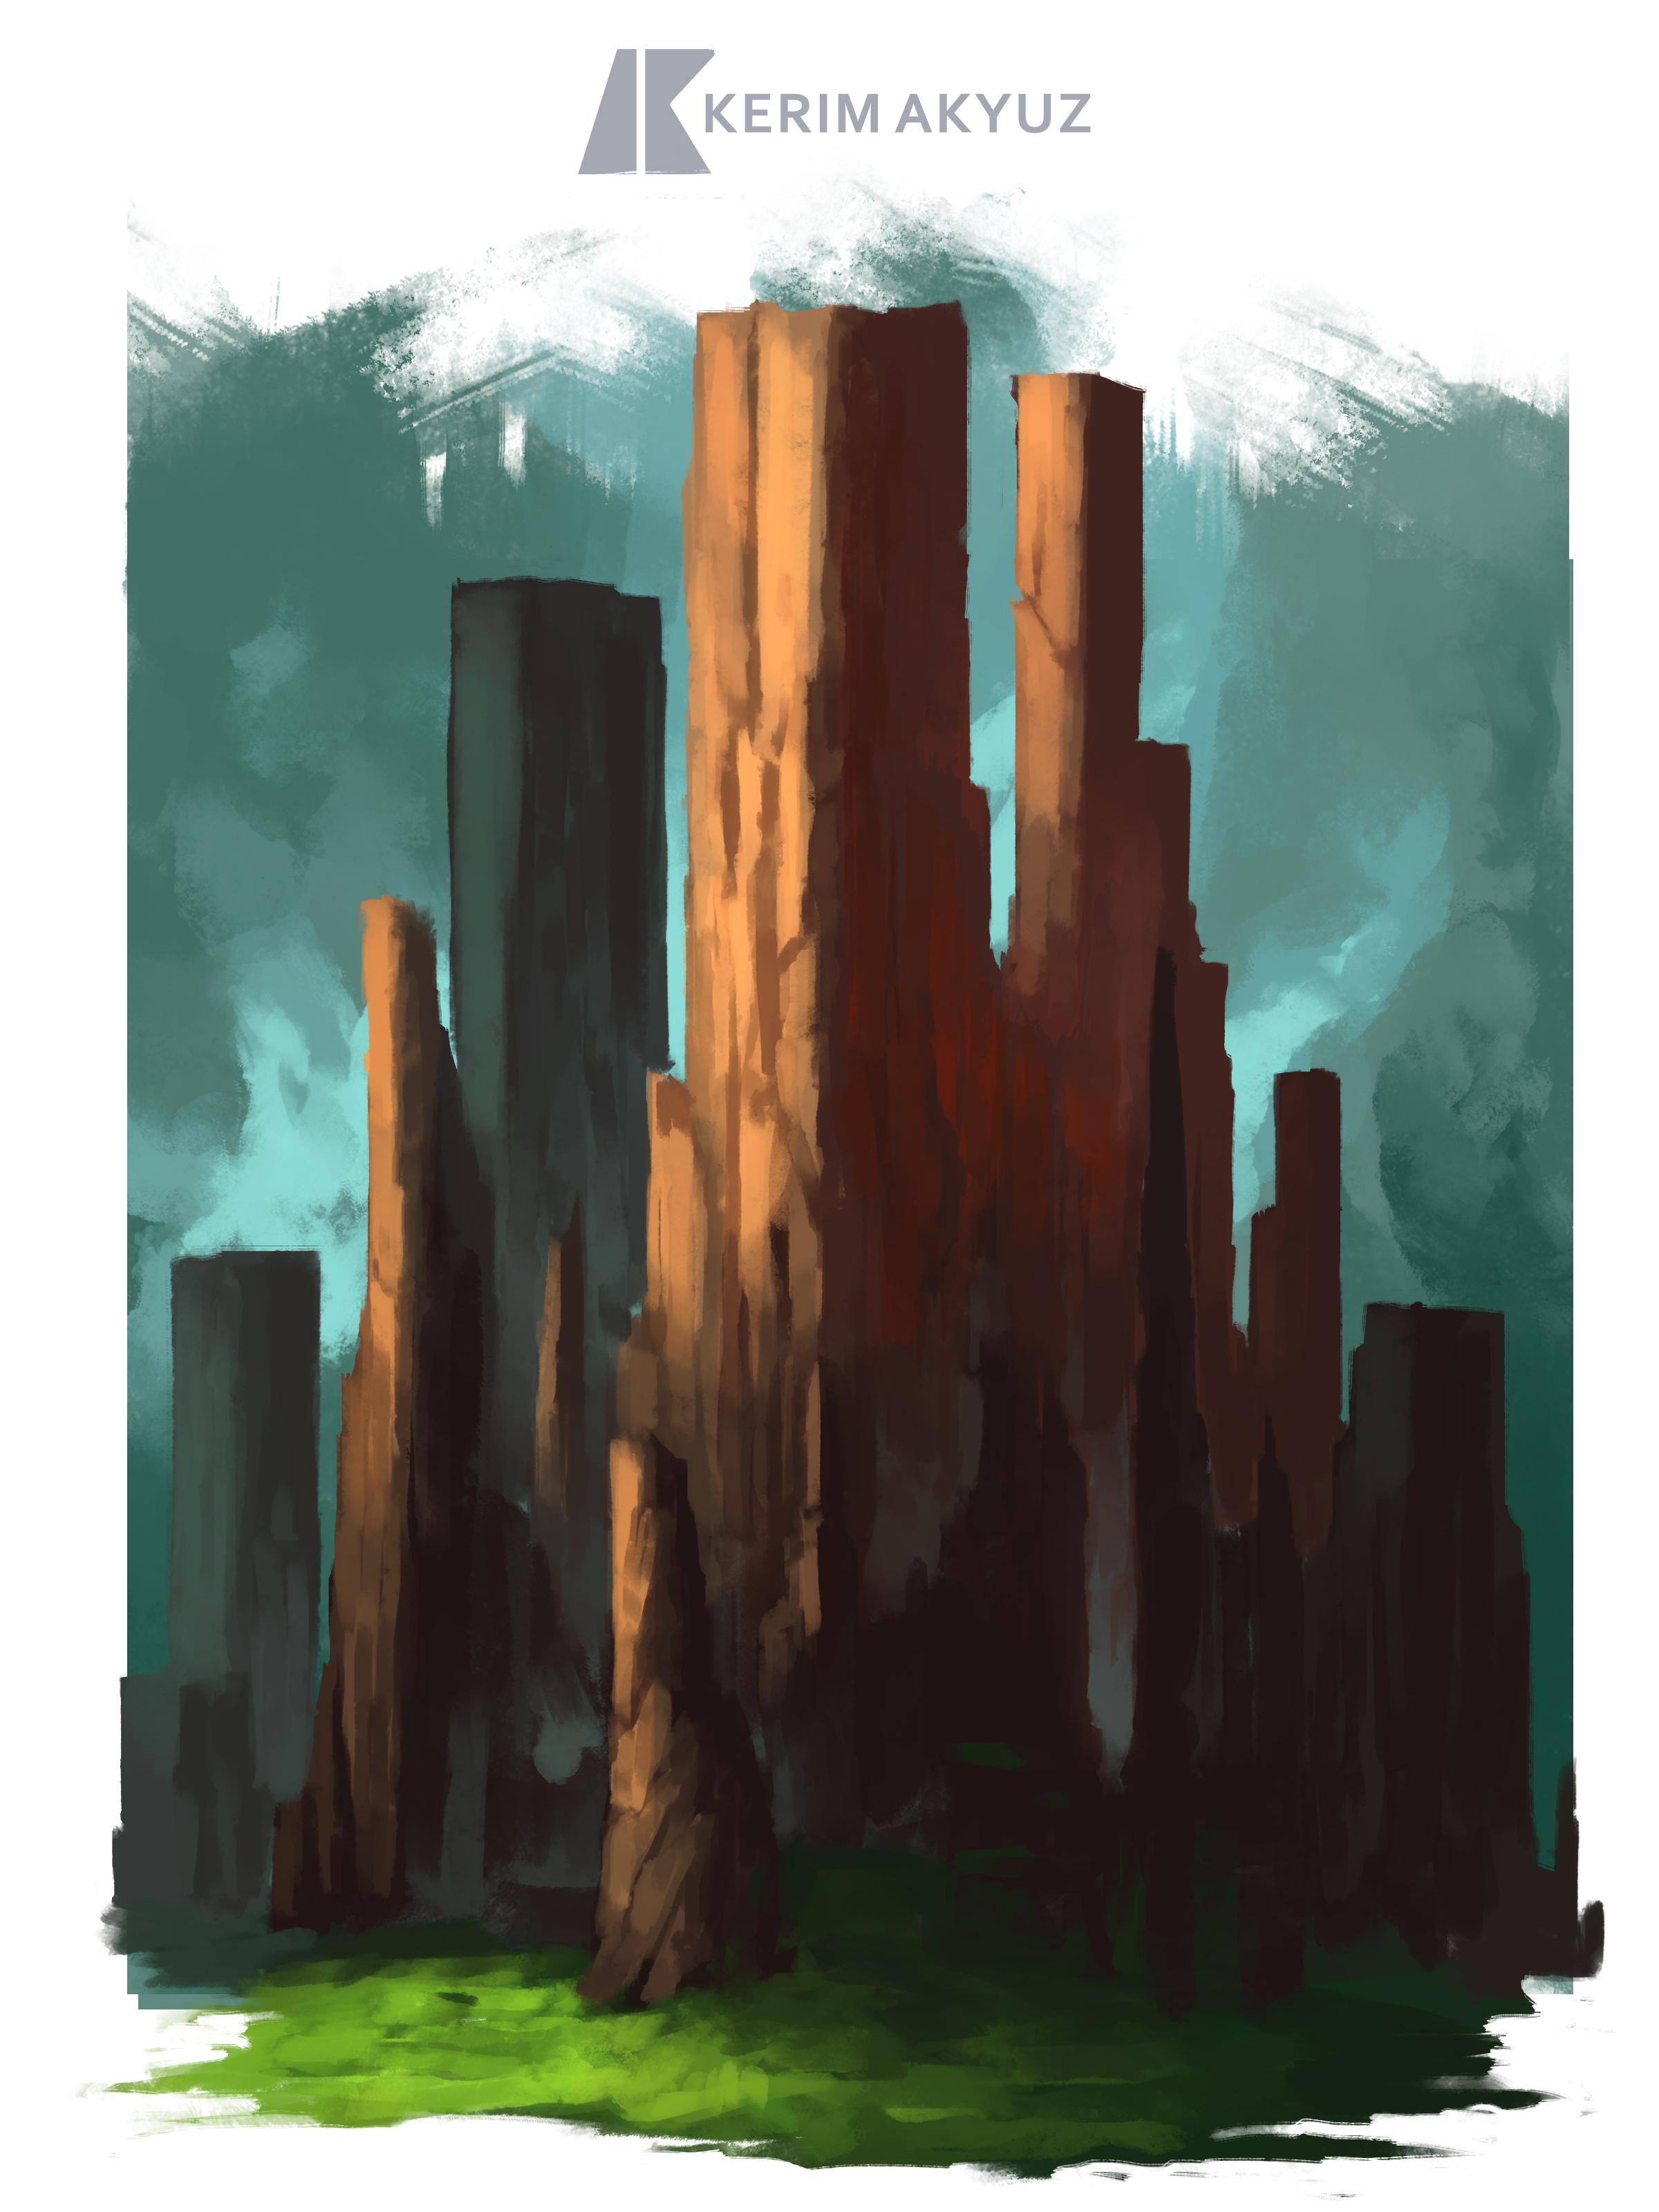 Daily Imagination #73 - Square Land